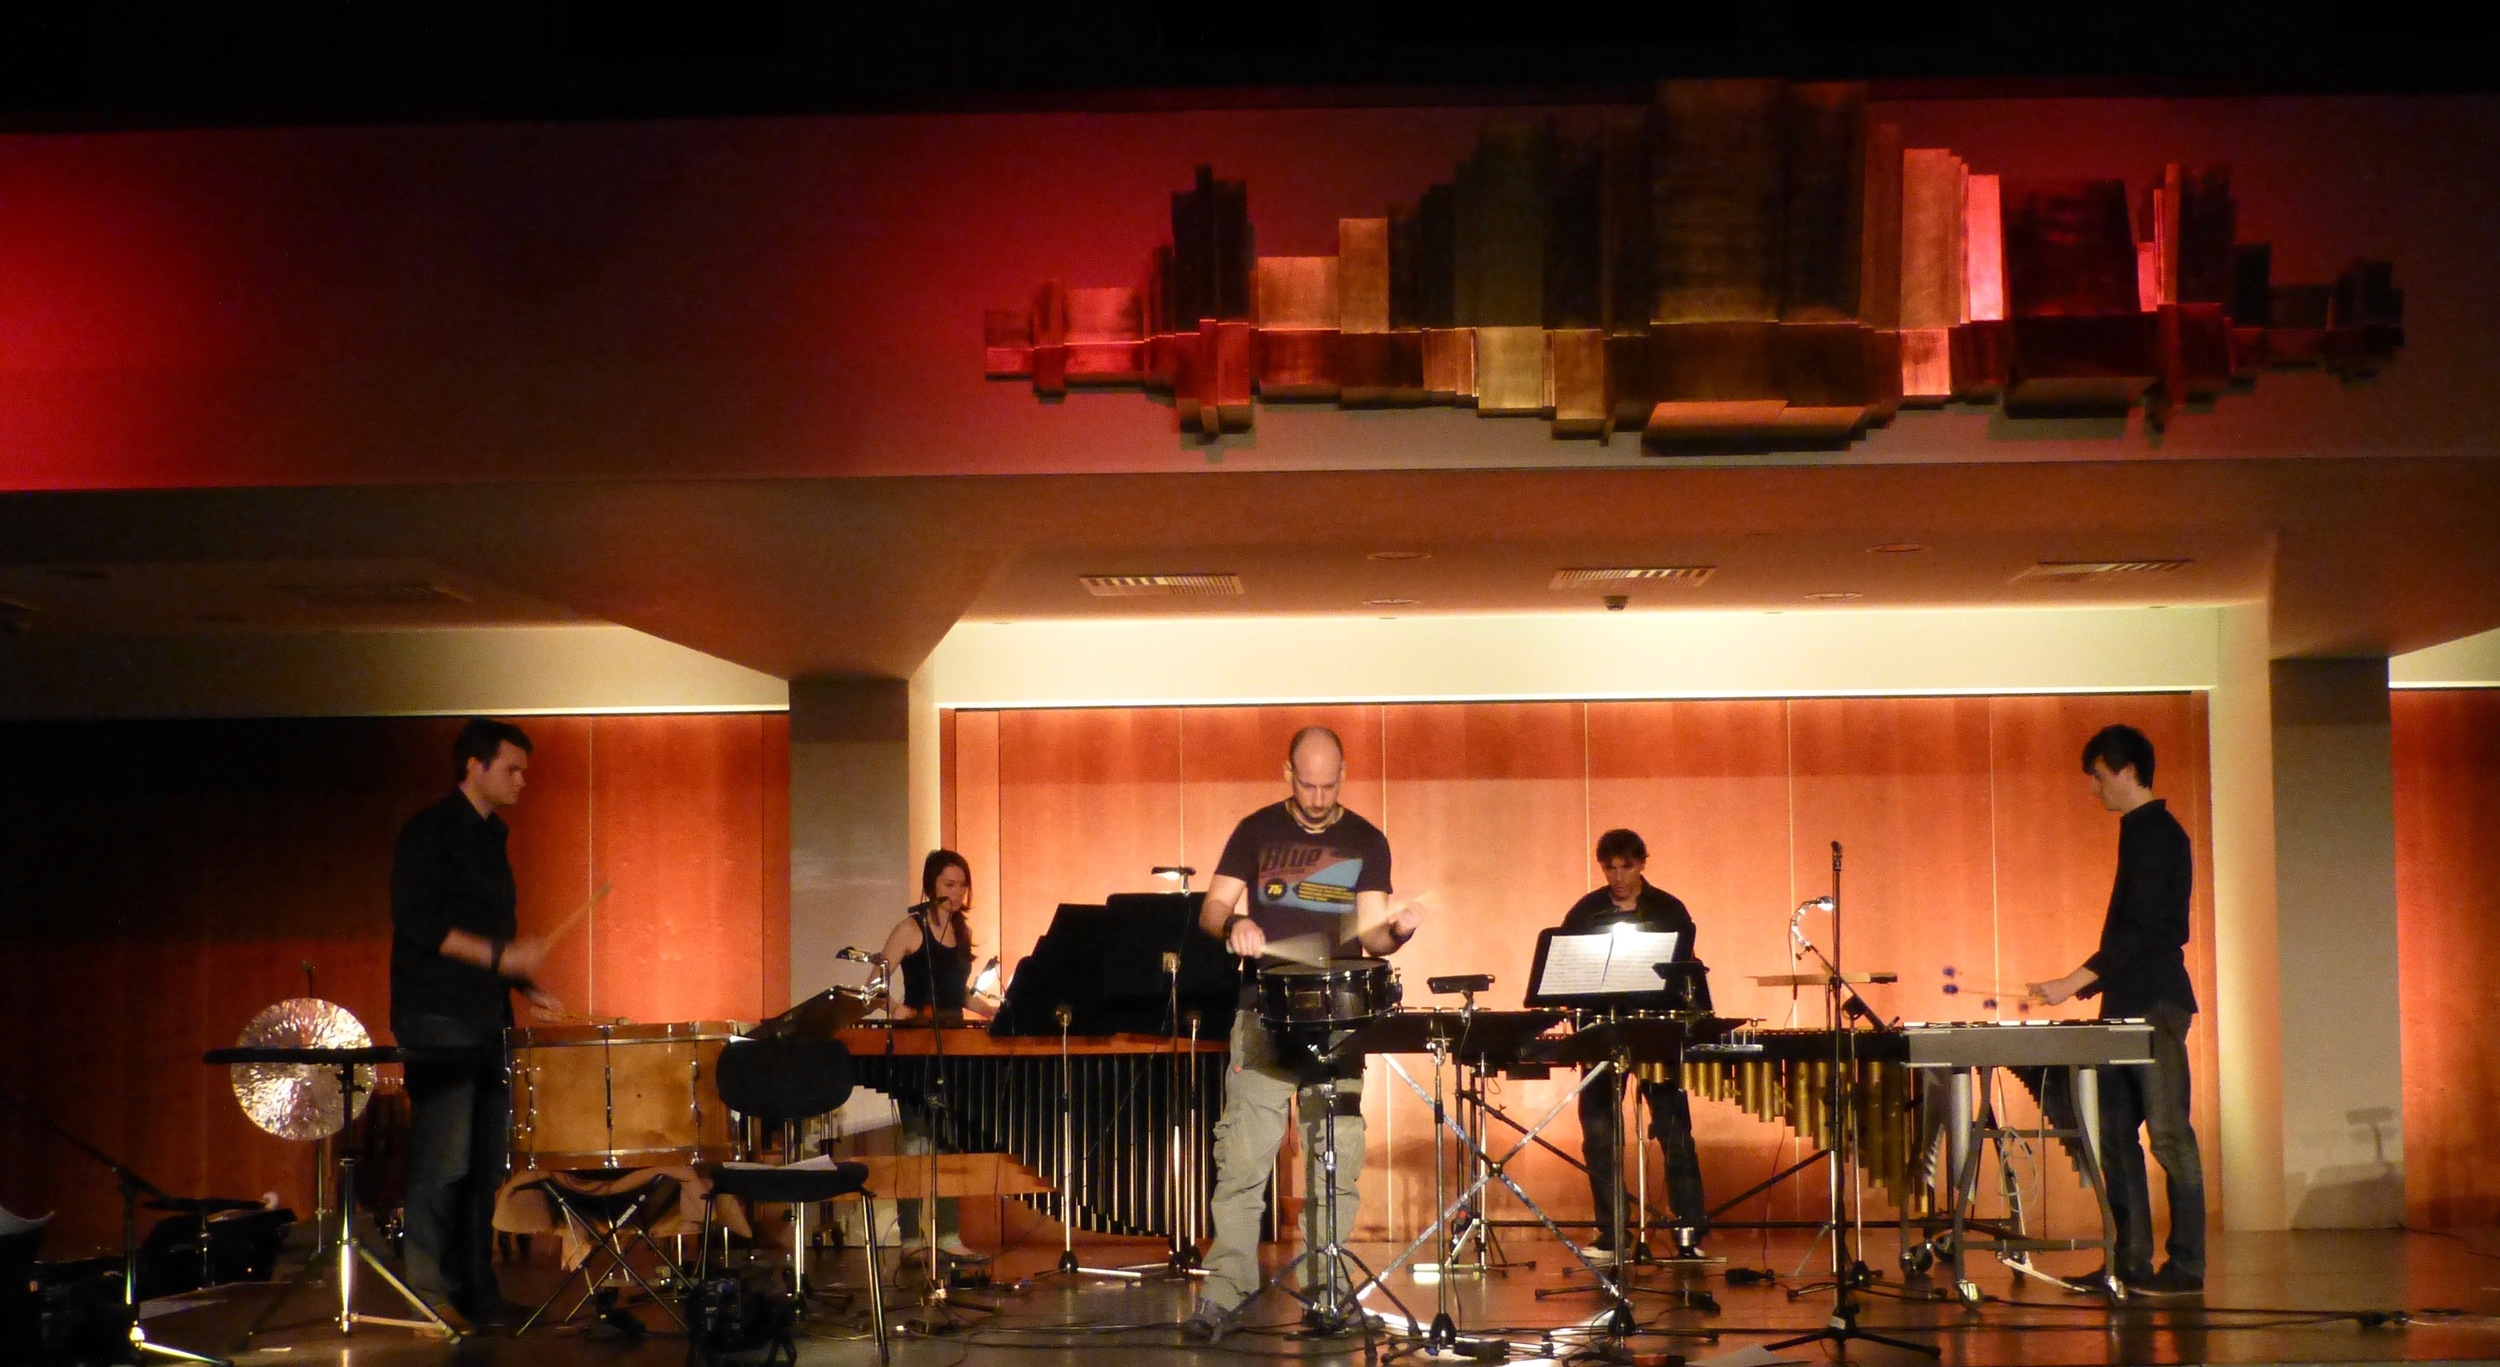 London Percussion at the Vaduzer Saal Liechtenstein with guest artist Max Naescher